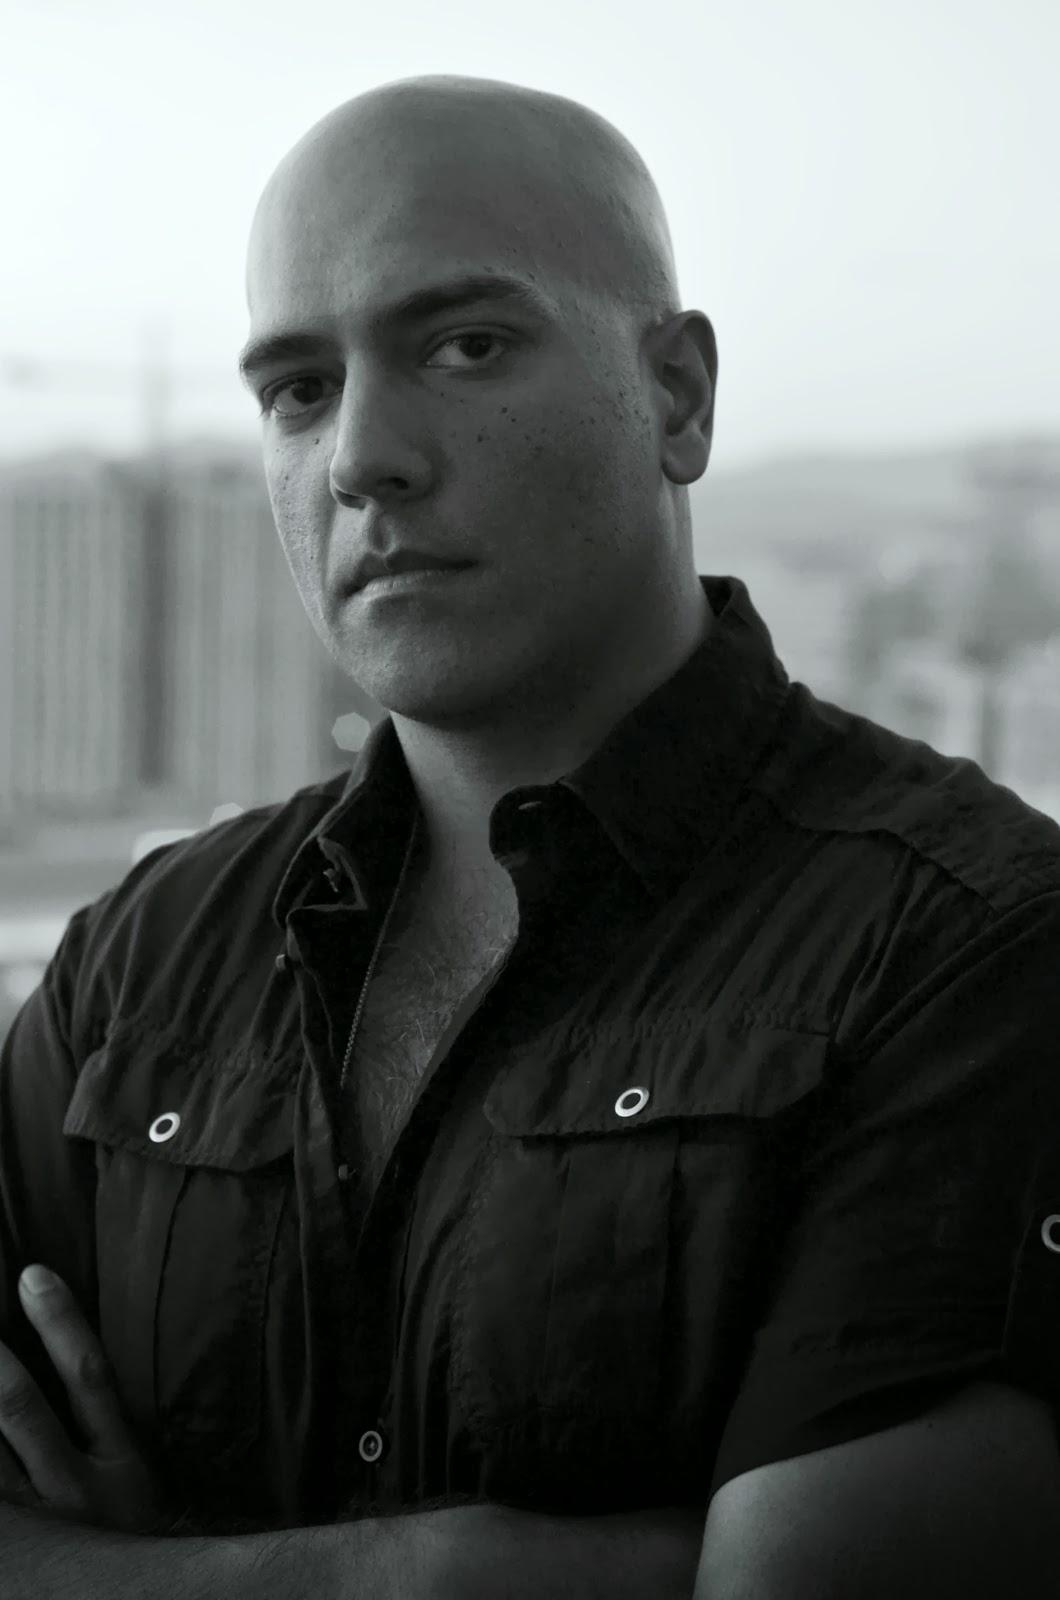 Hassan Riaz 01.JPG